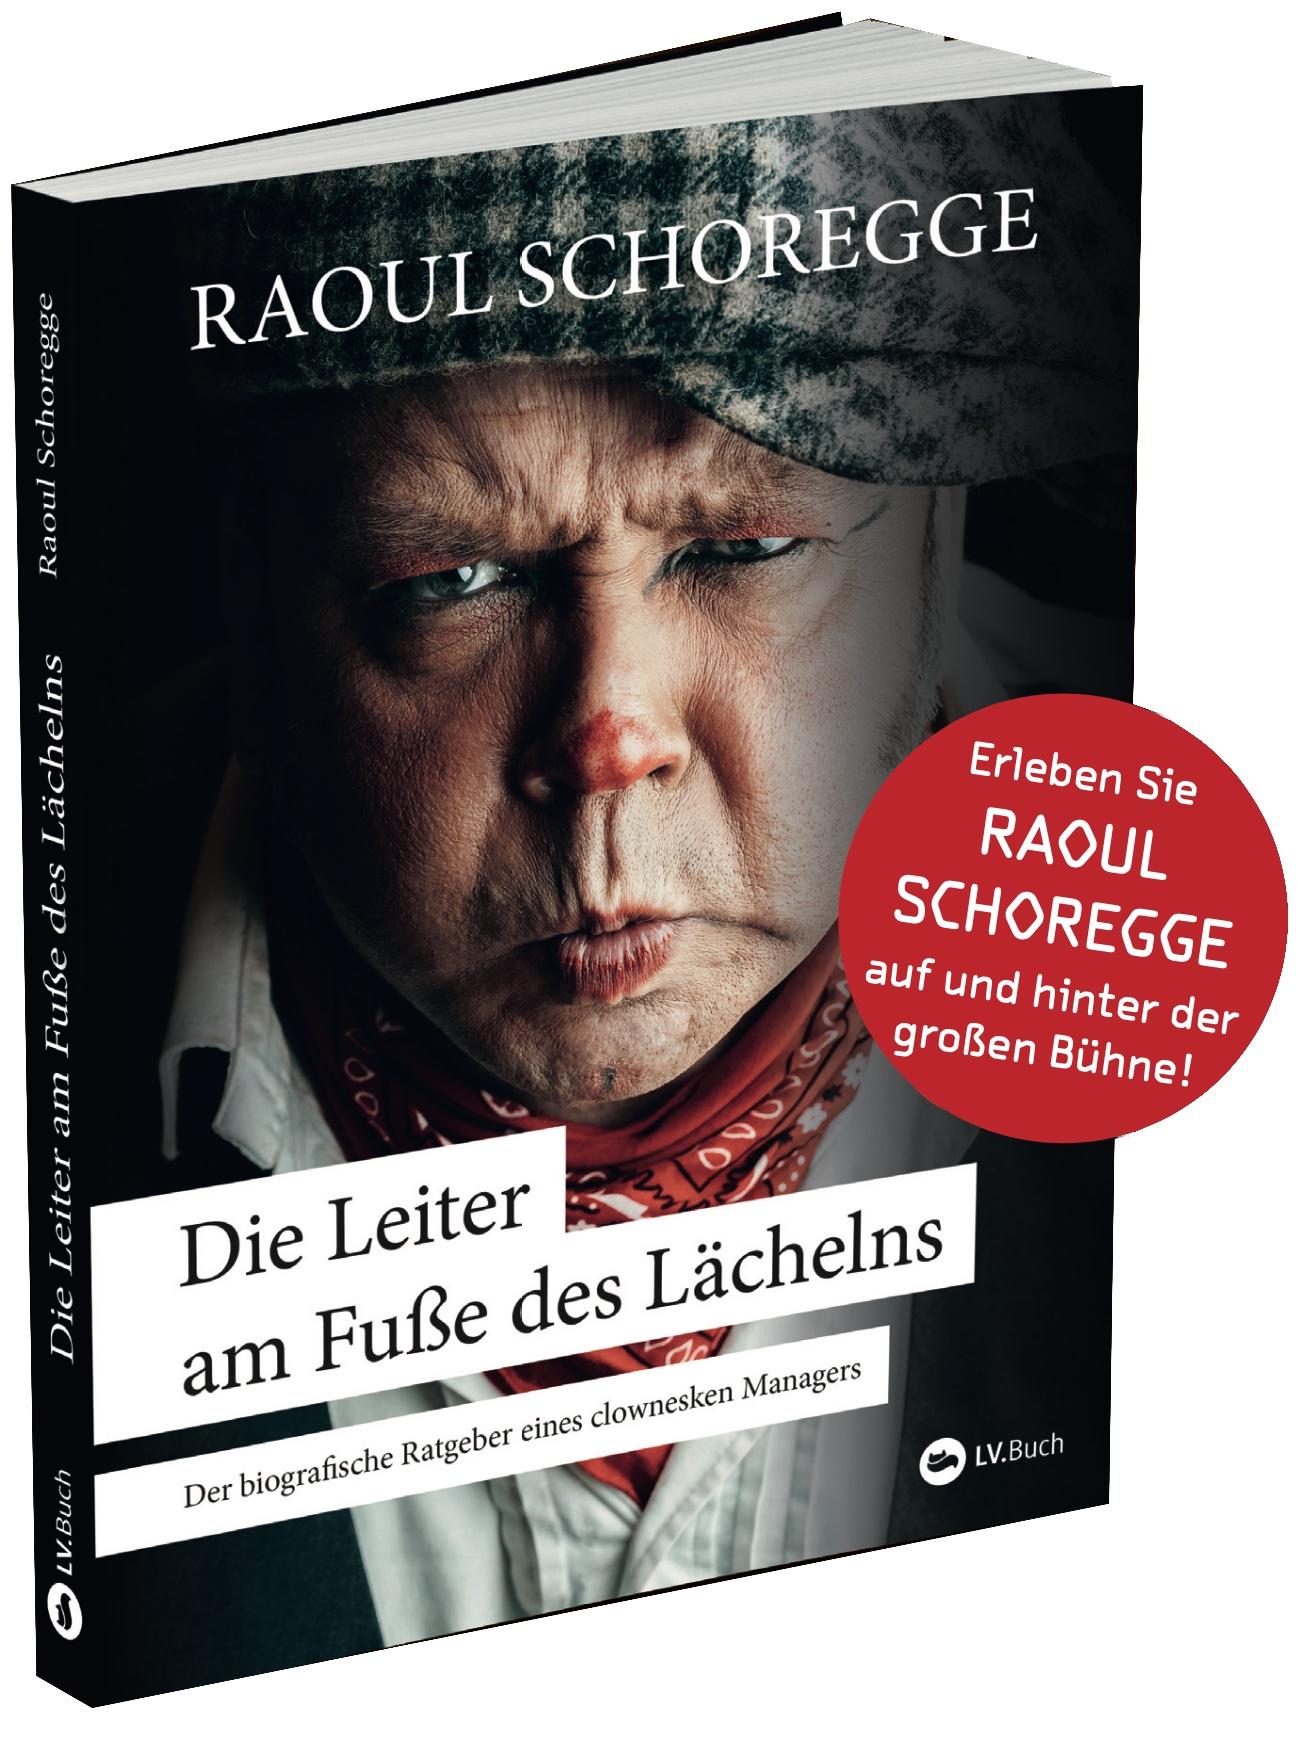 Die Leiter am Fuße des Lächelns - Raoul Schoregge